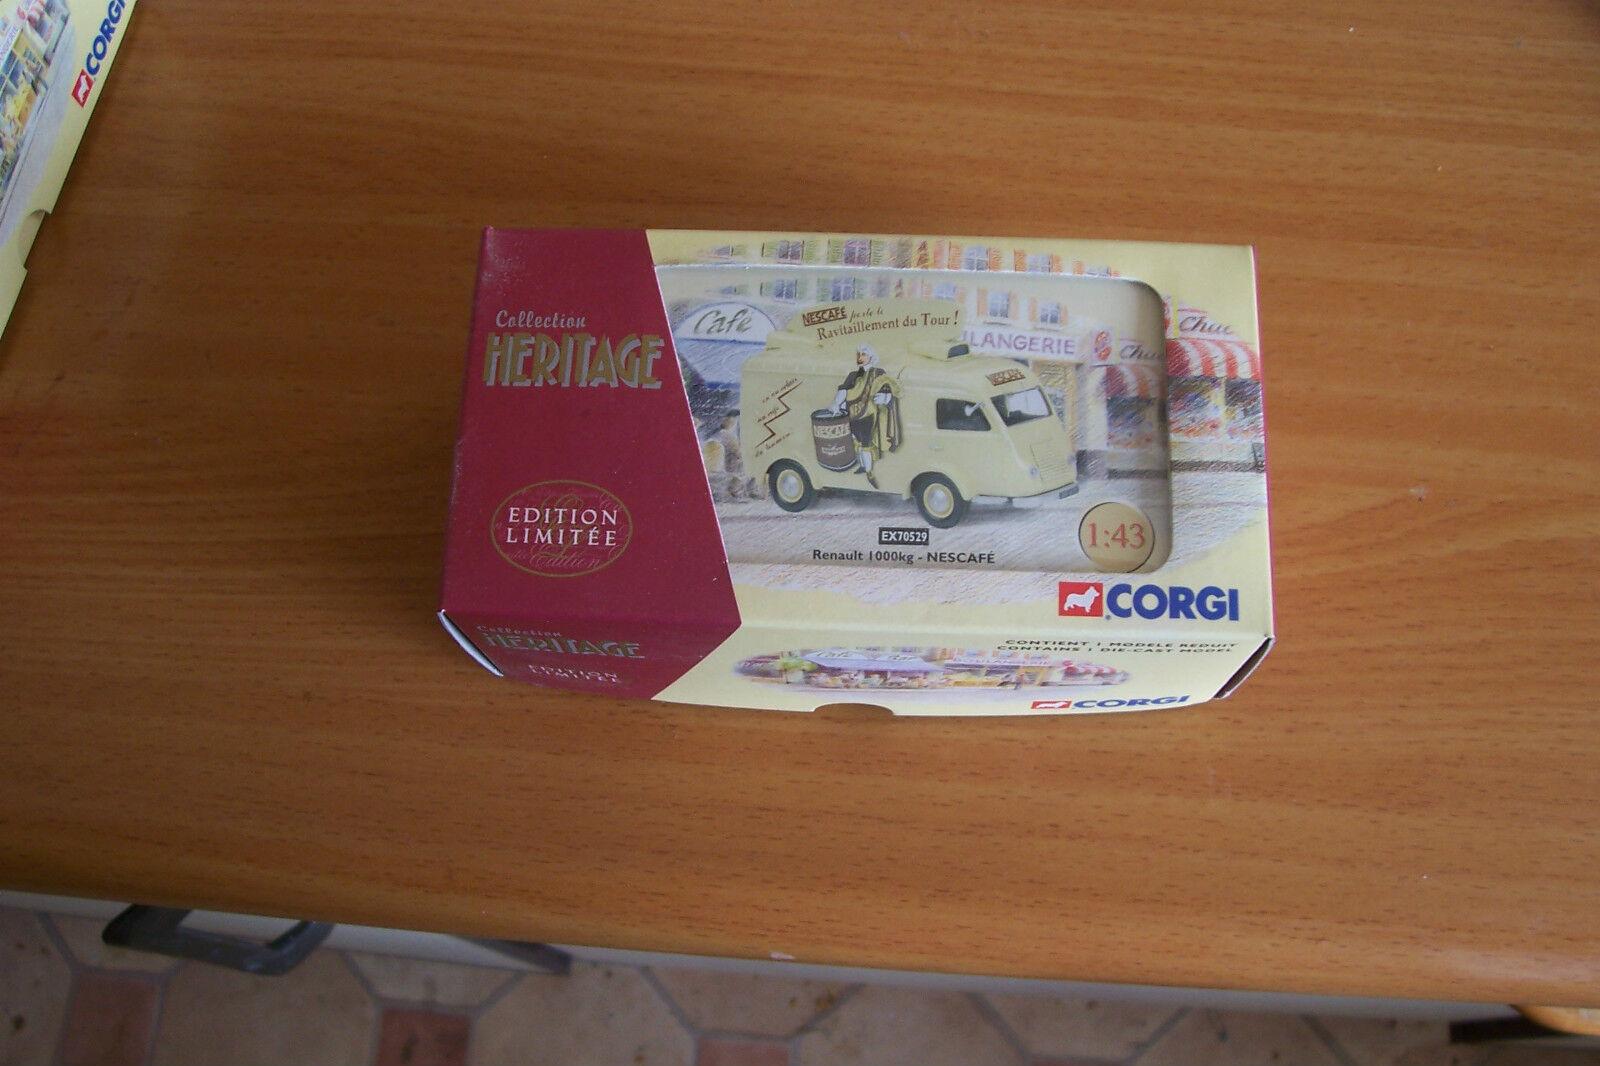 CORGI 1 43 EX70529 Ricqles Renault vintage van